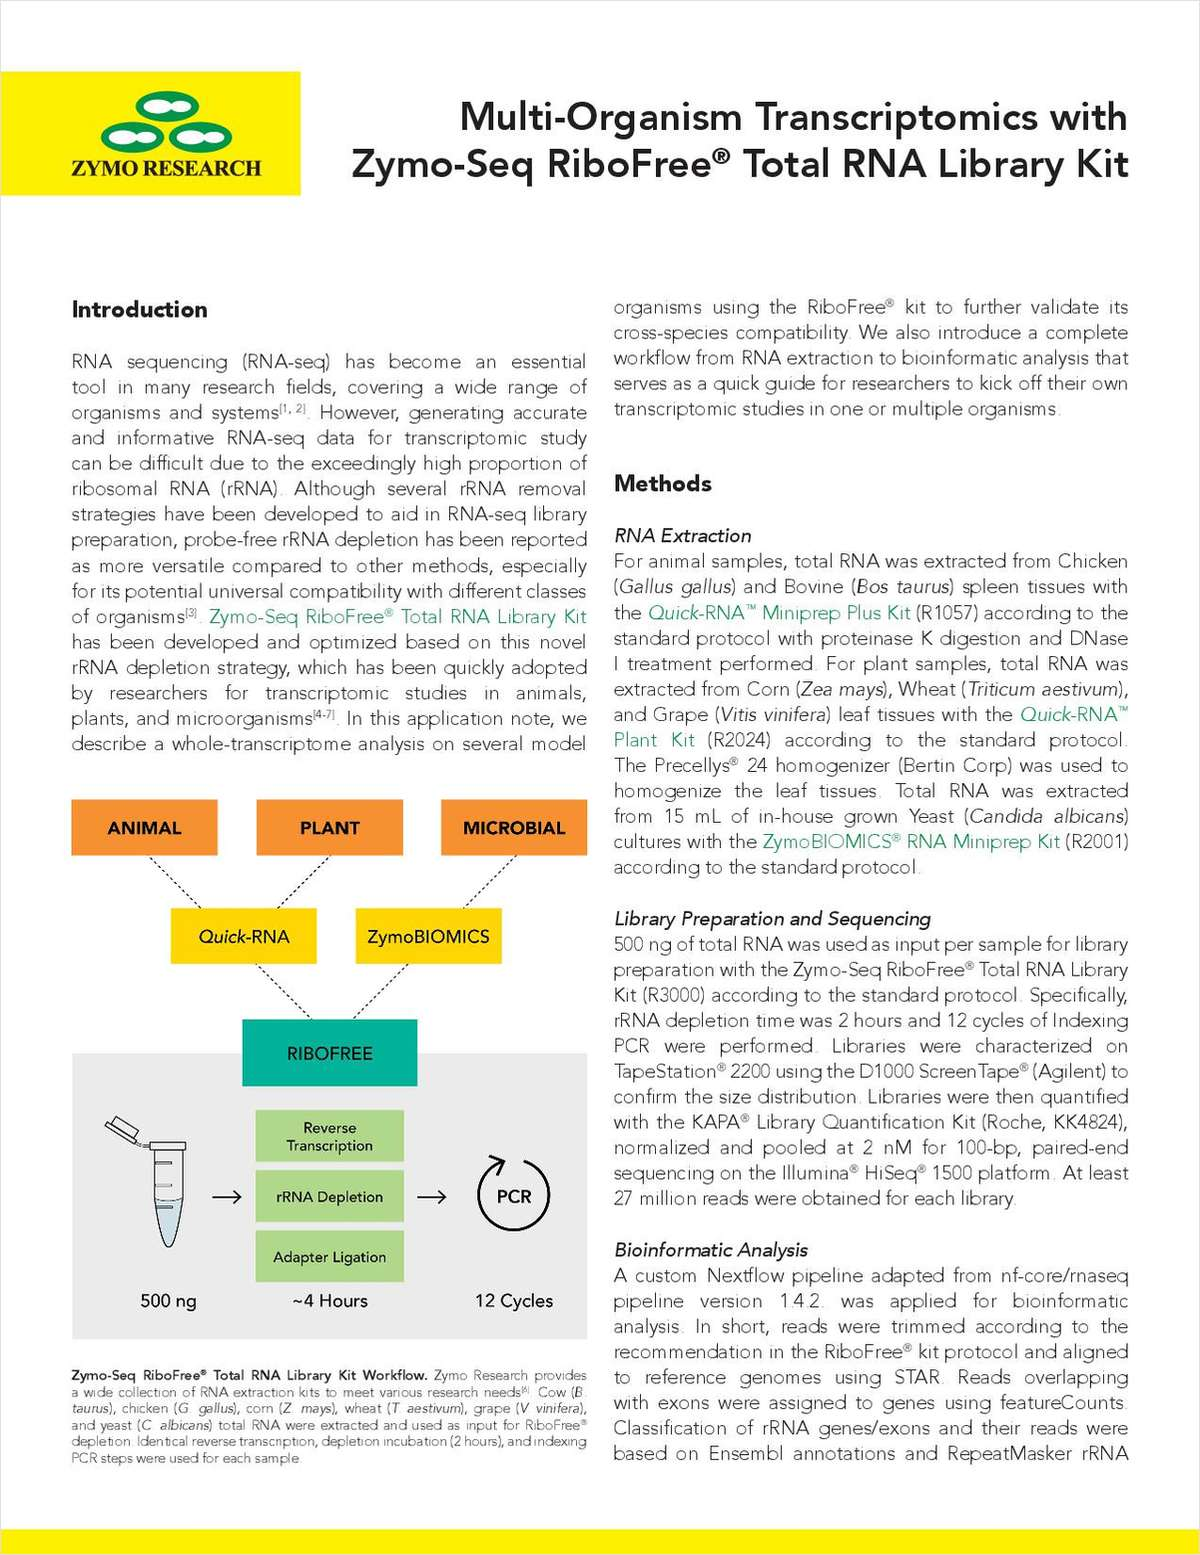 Multi-Organism Transcriptomics with Zymo-Seq RiboFree Total RNA Library Kit